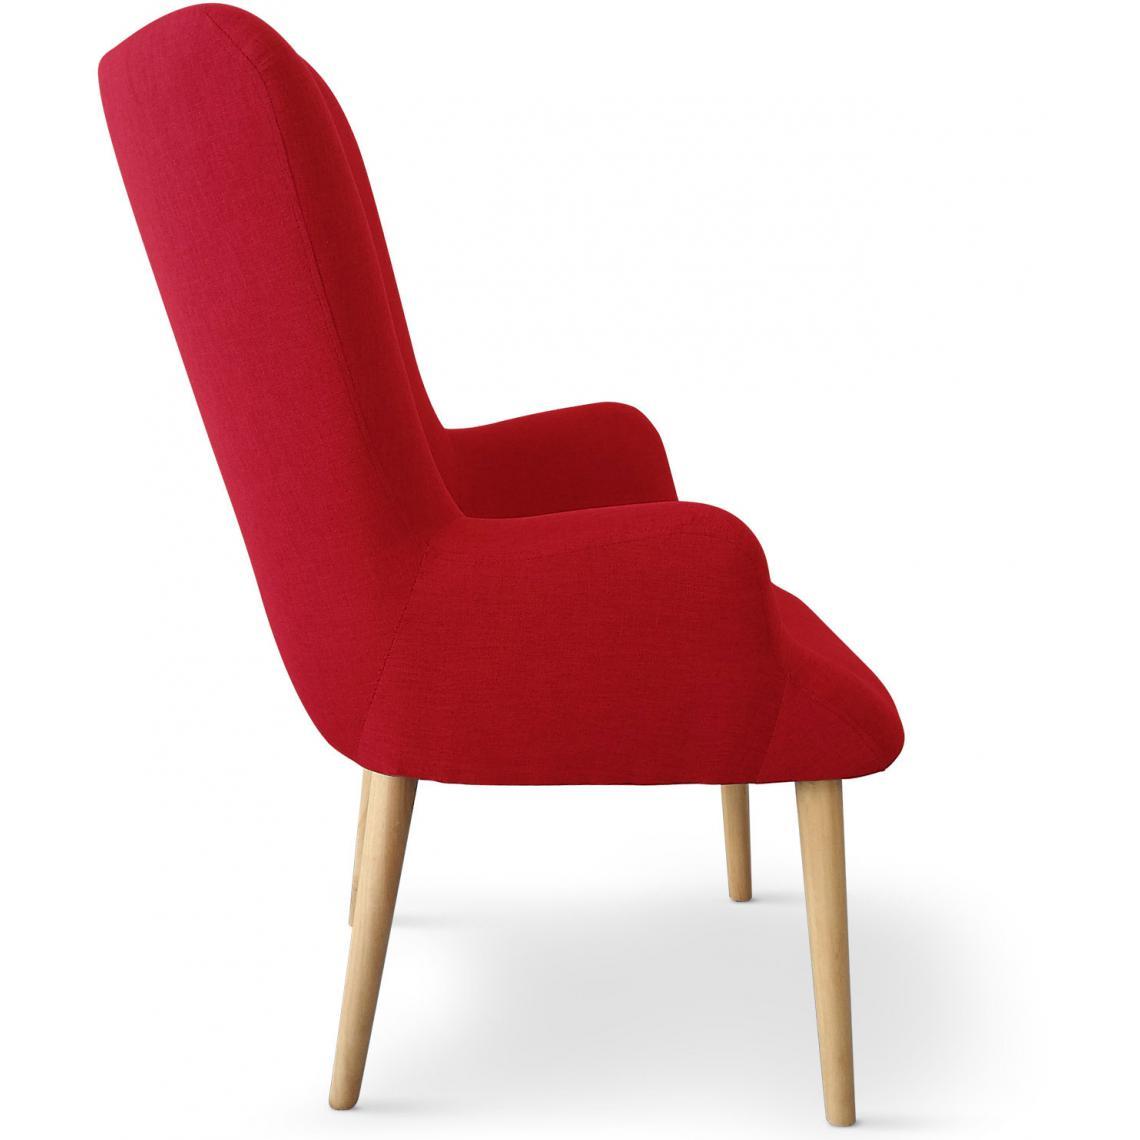 fauteuil scandinave rouge rivka 3 suisses